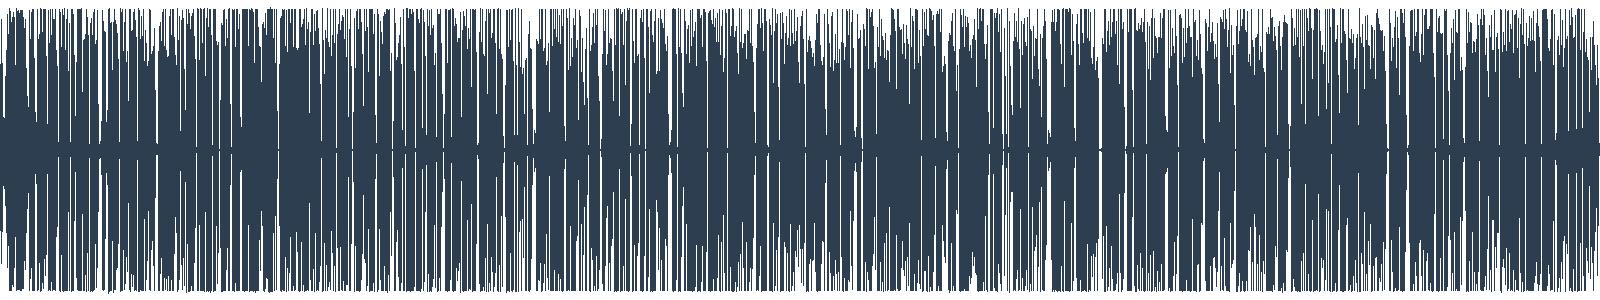 #23 Slovenská dráma po roku 1945 (Maturita s Hashtagom) waveform